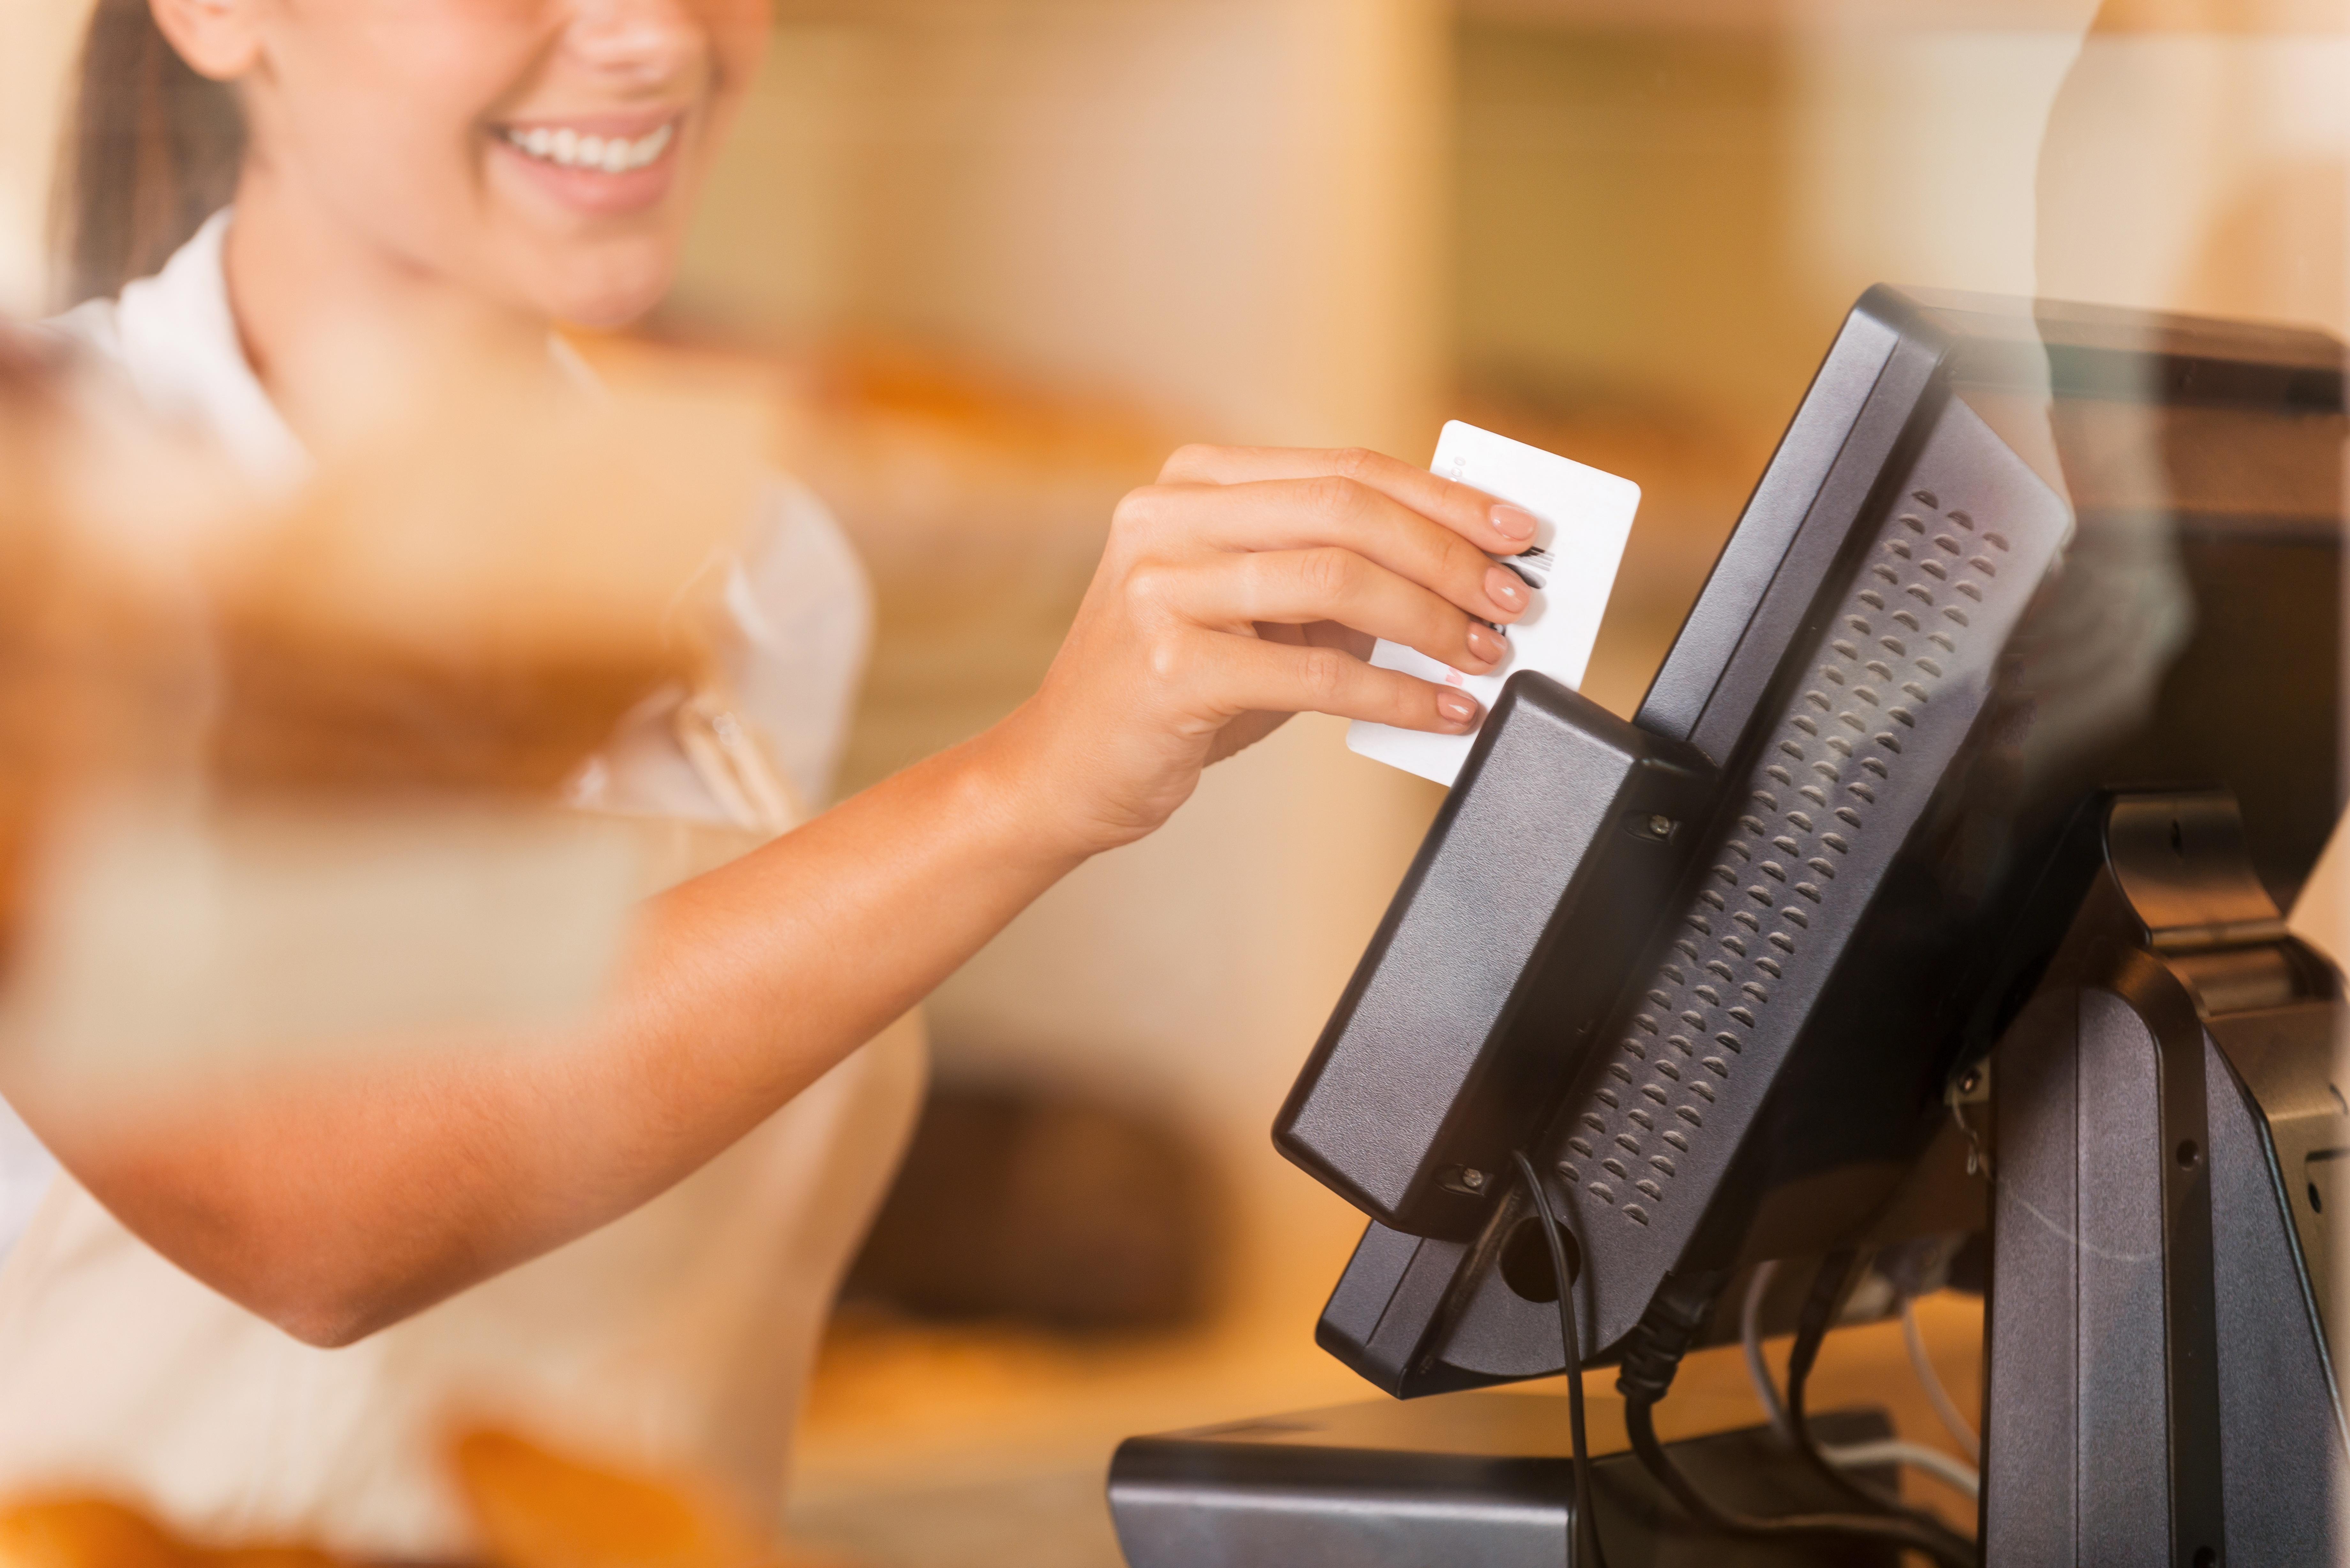 Swiping-Card-Cash-Register.jpg